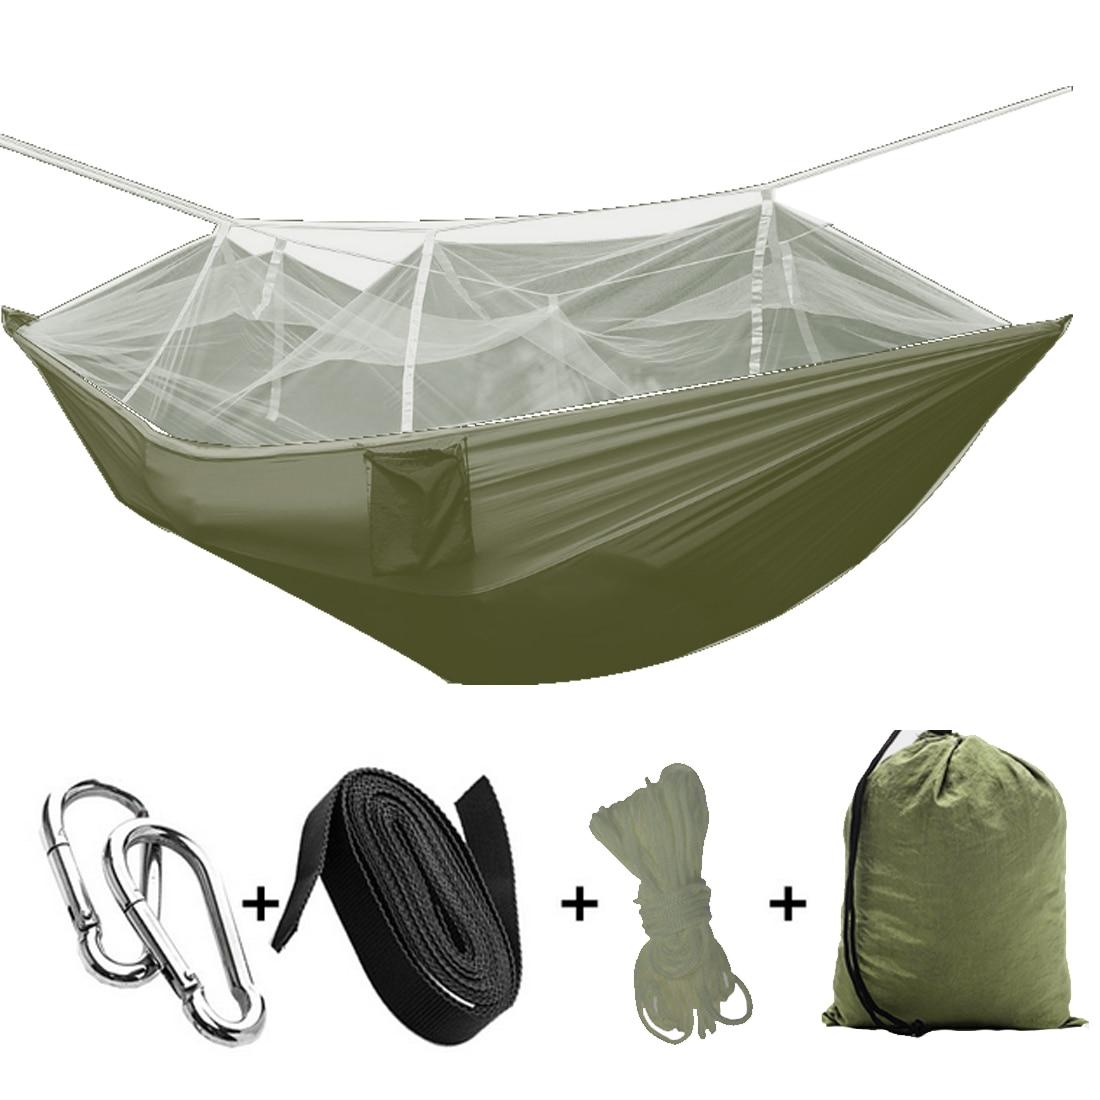 260x140cm Portable Parachute Fabric Camping Hammock Hanging Bed With Mosquito Net Sleeping Hammock outdoor hammock